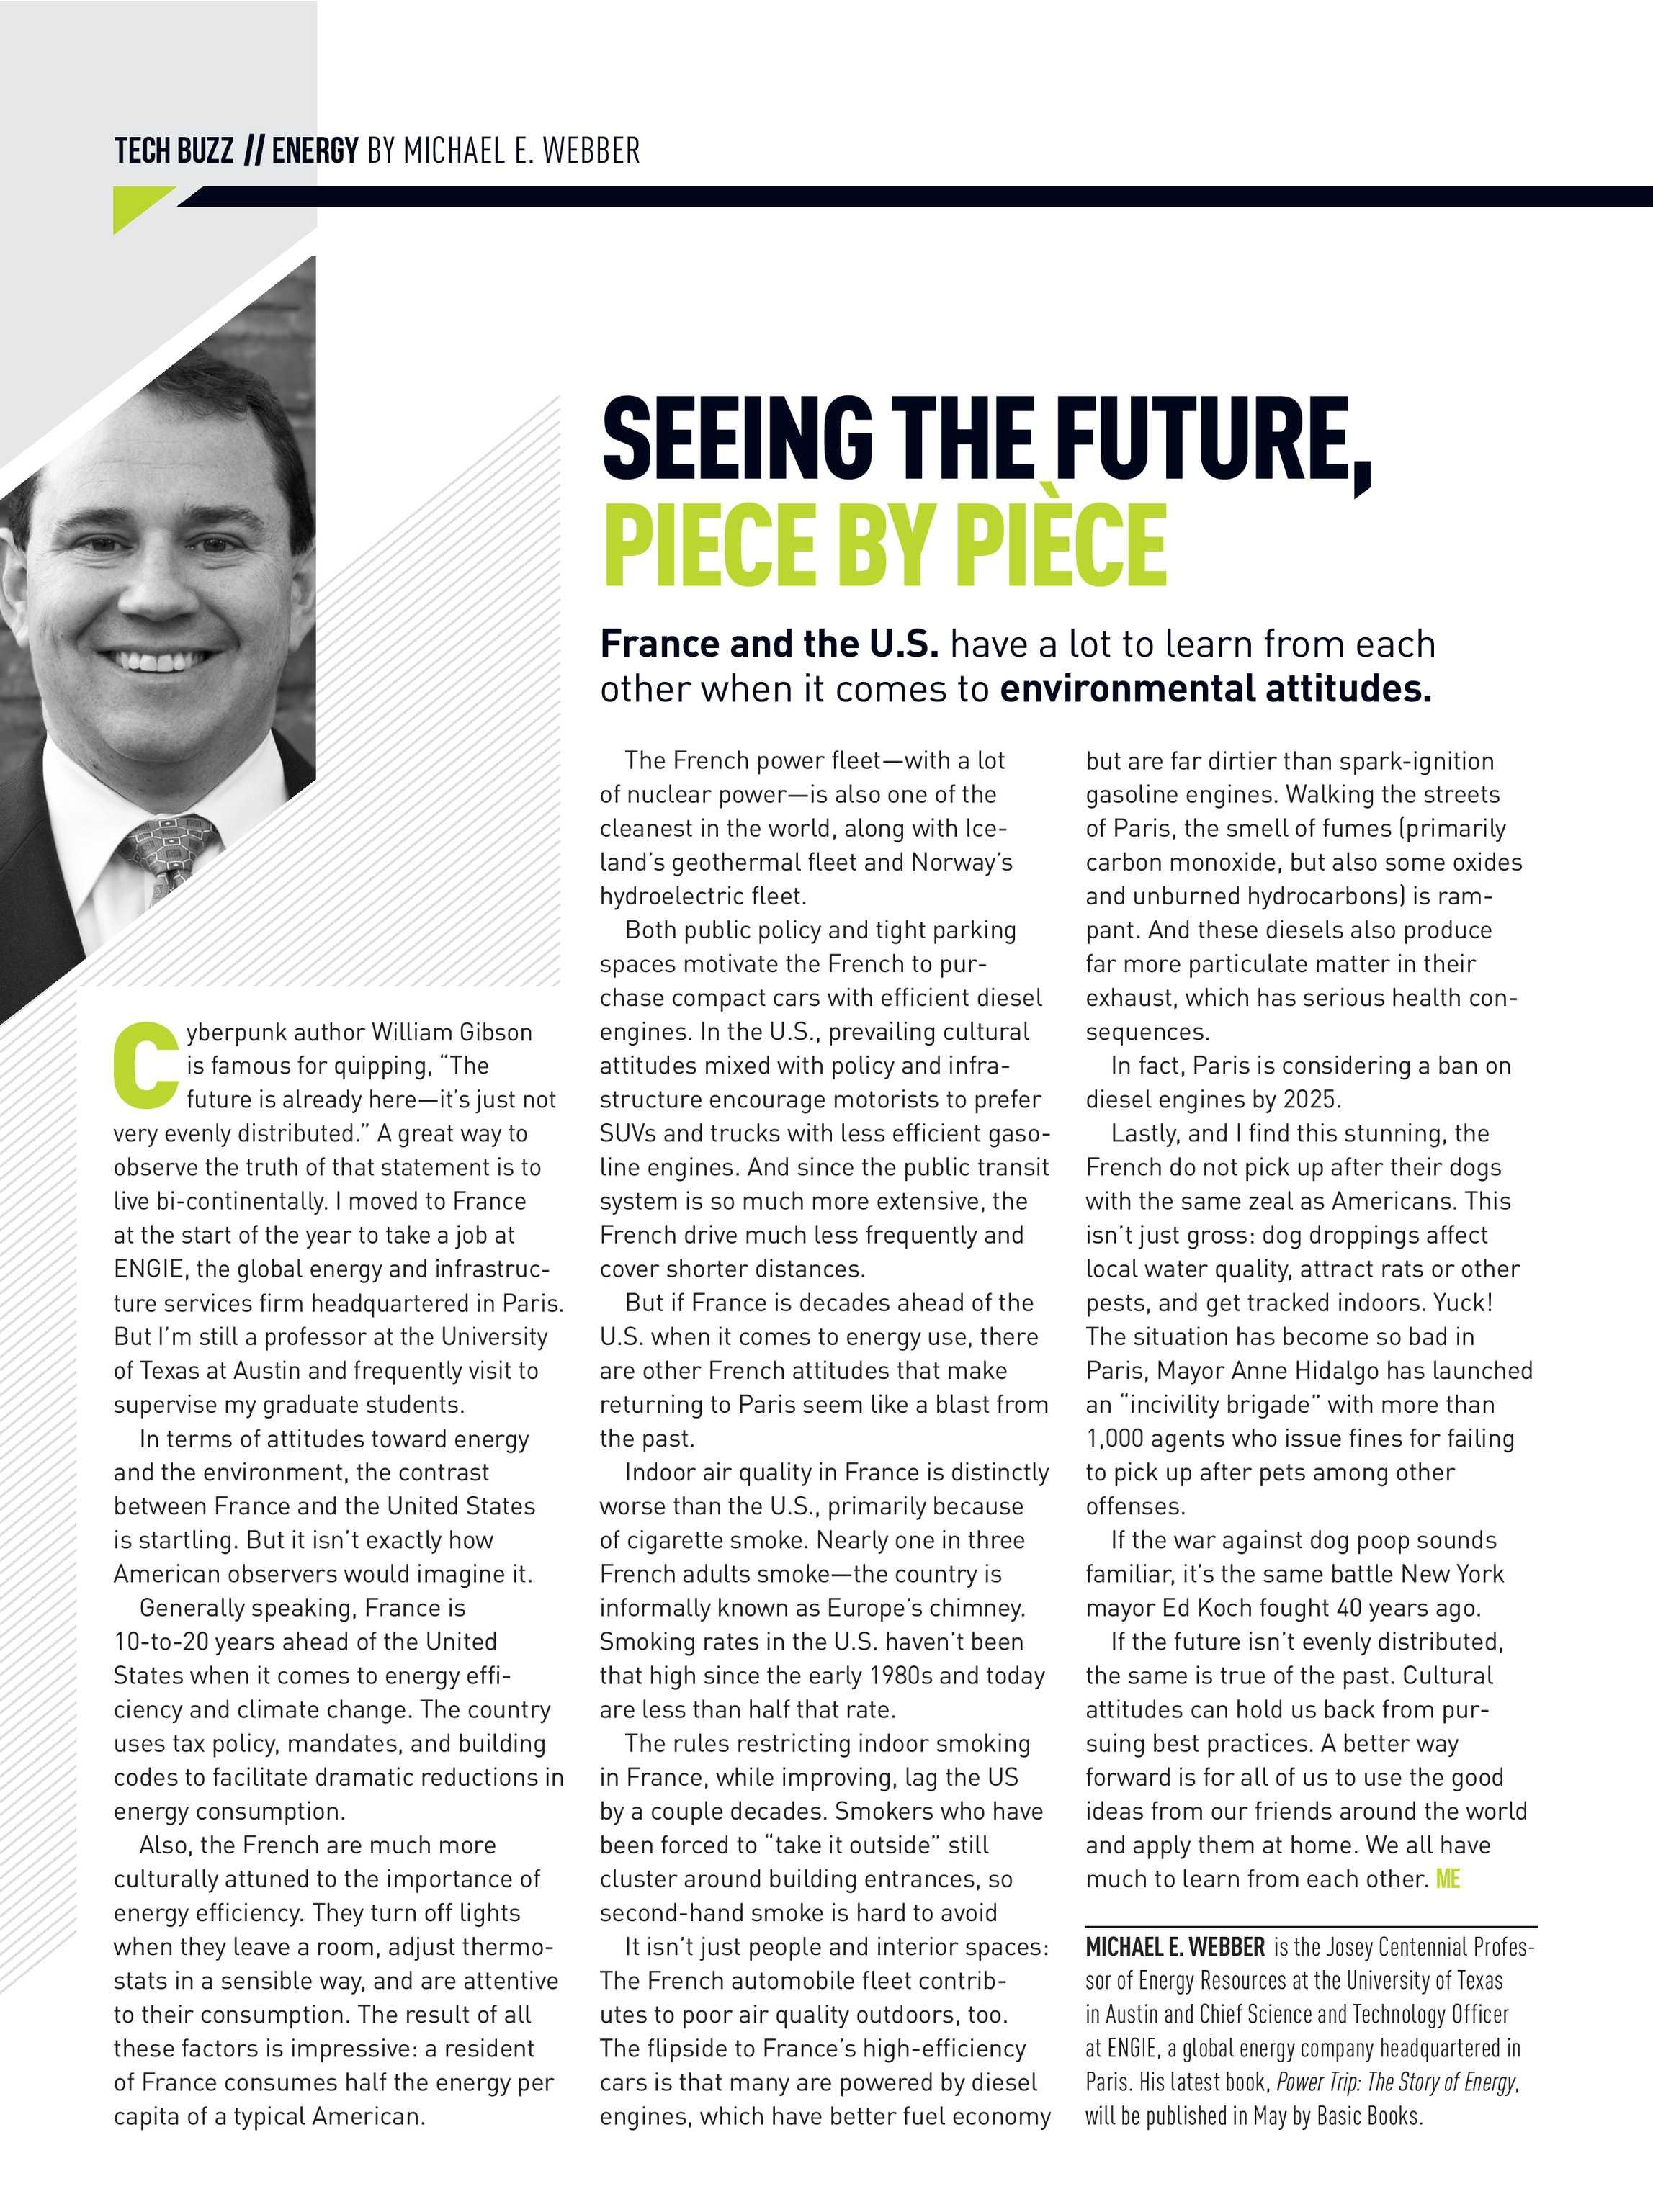 Mechanical Engineering Magazine - May 2019 - page 16